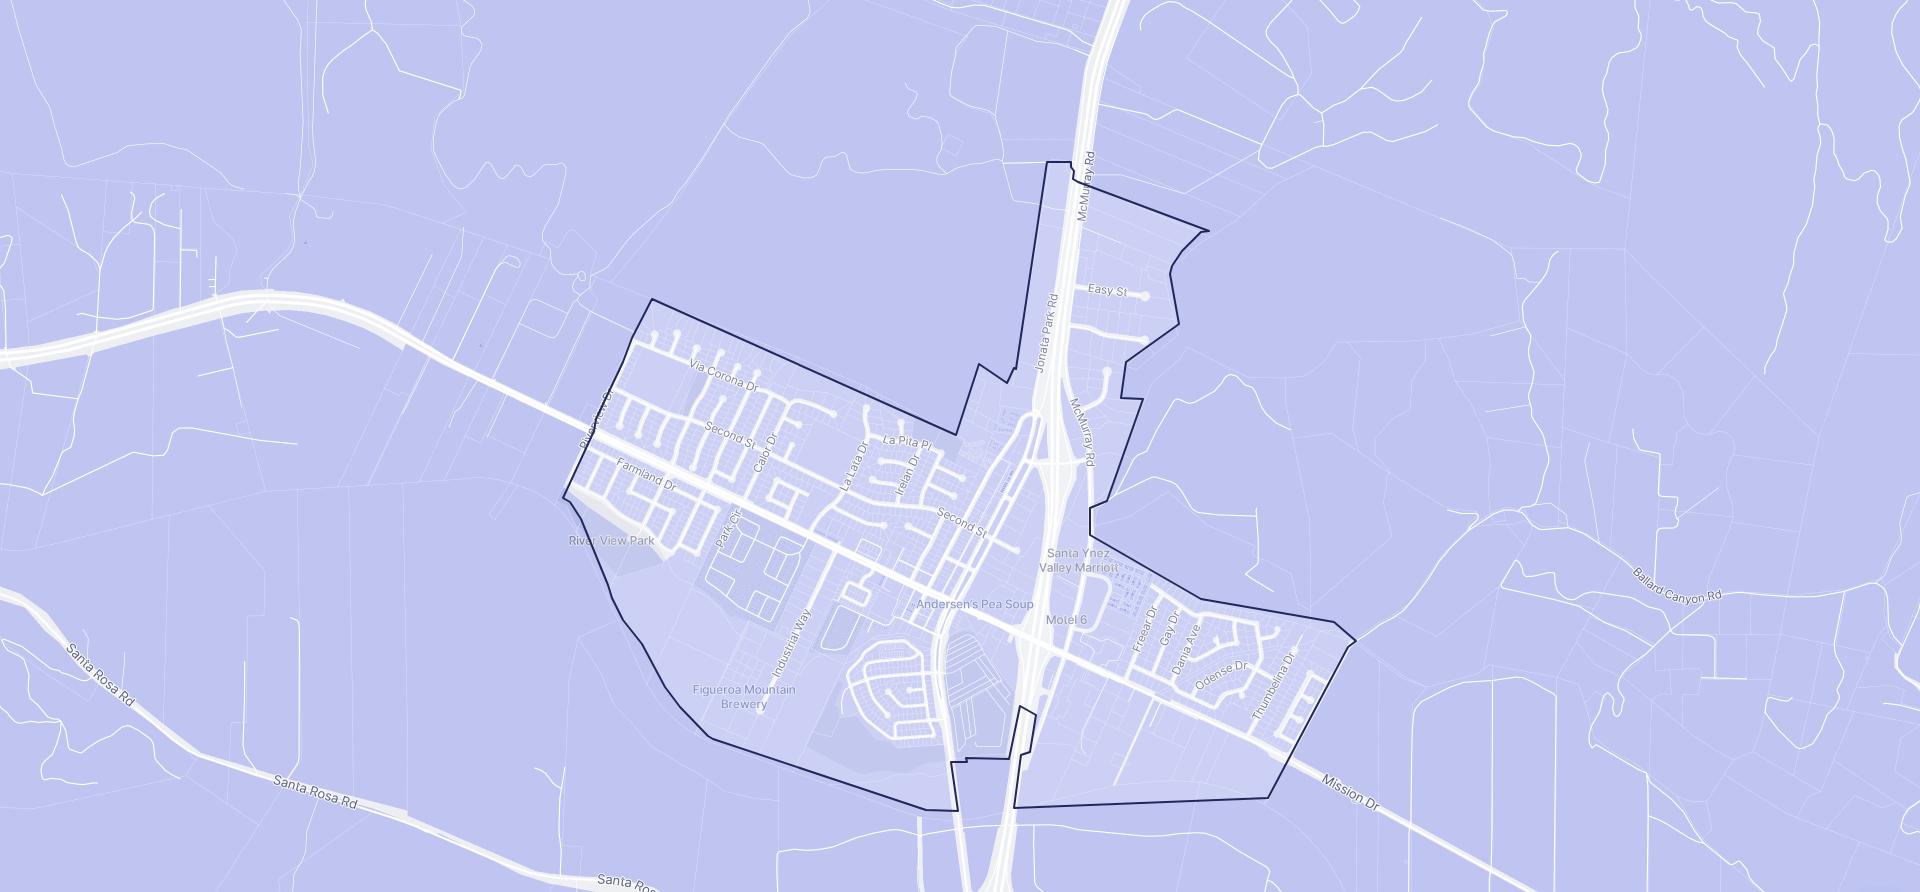 Image of Buellton boundaries on a map.